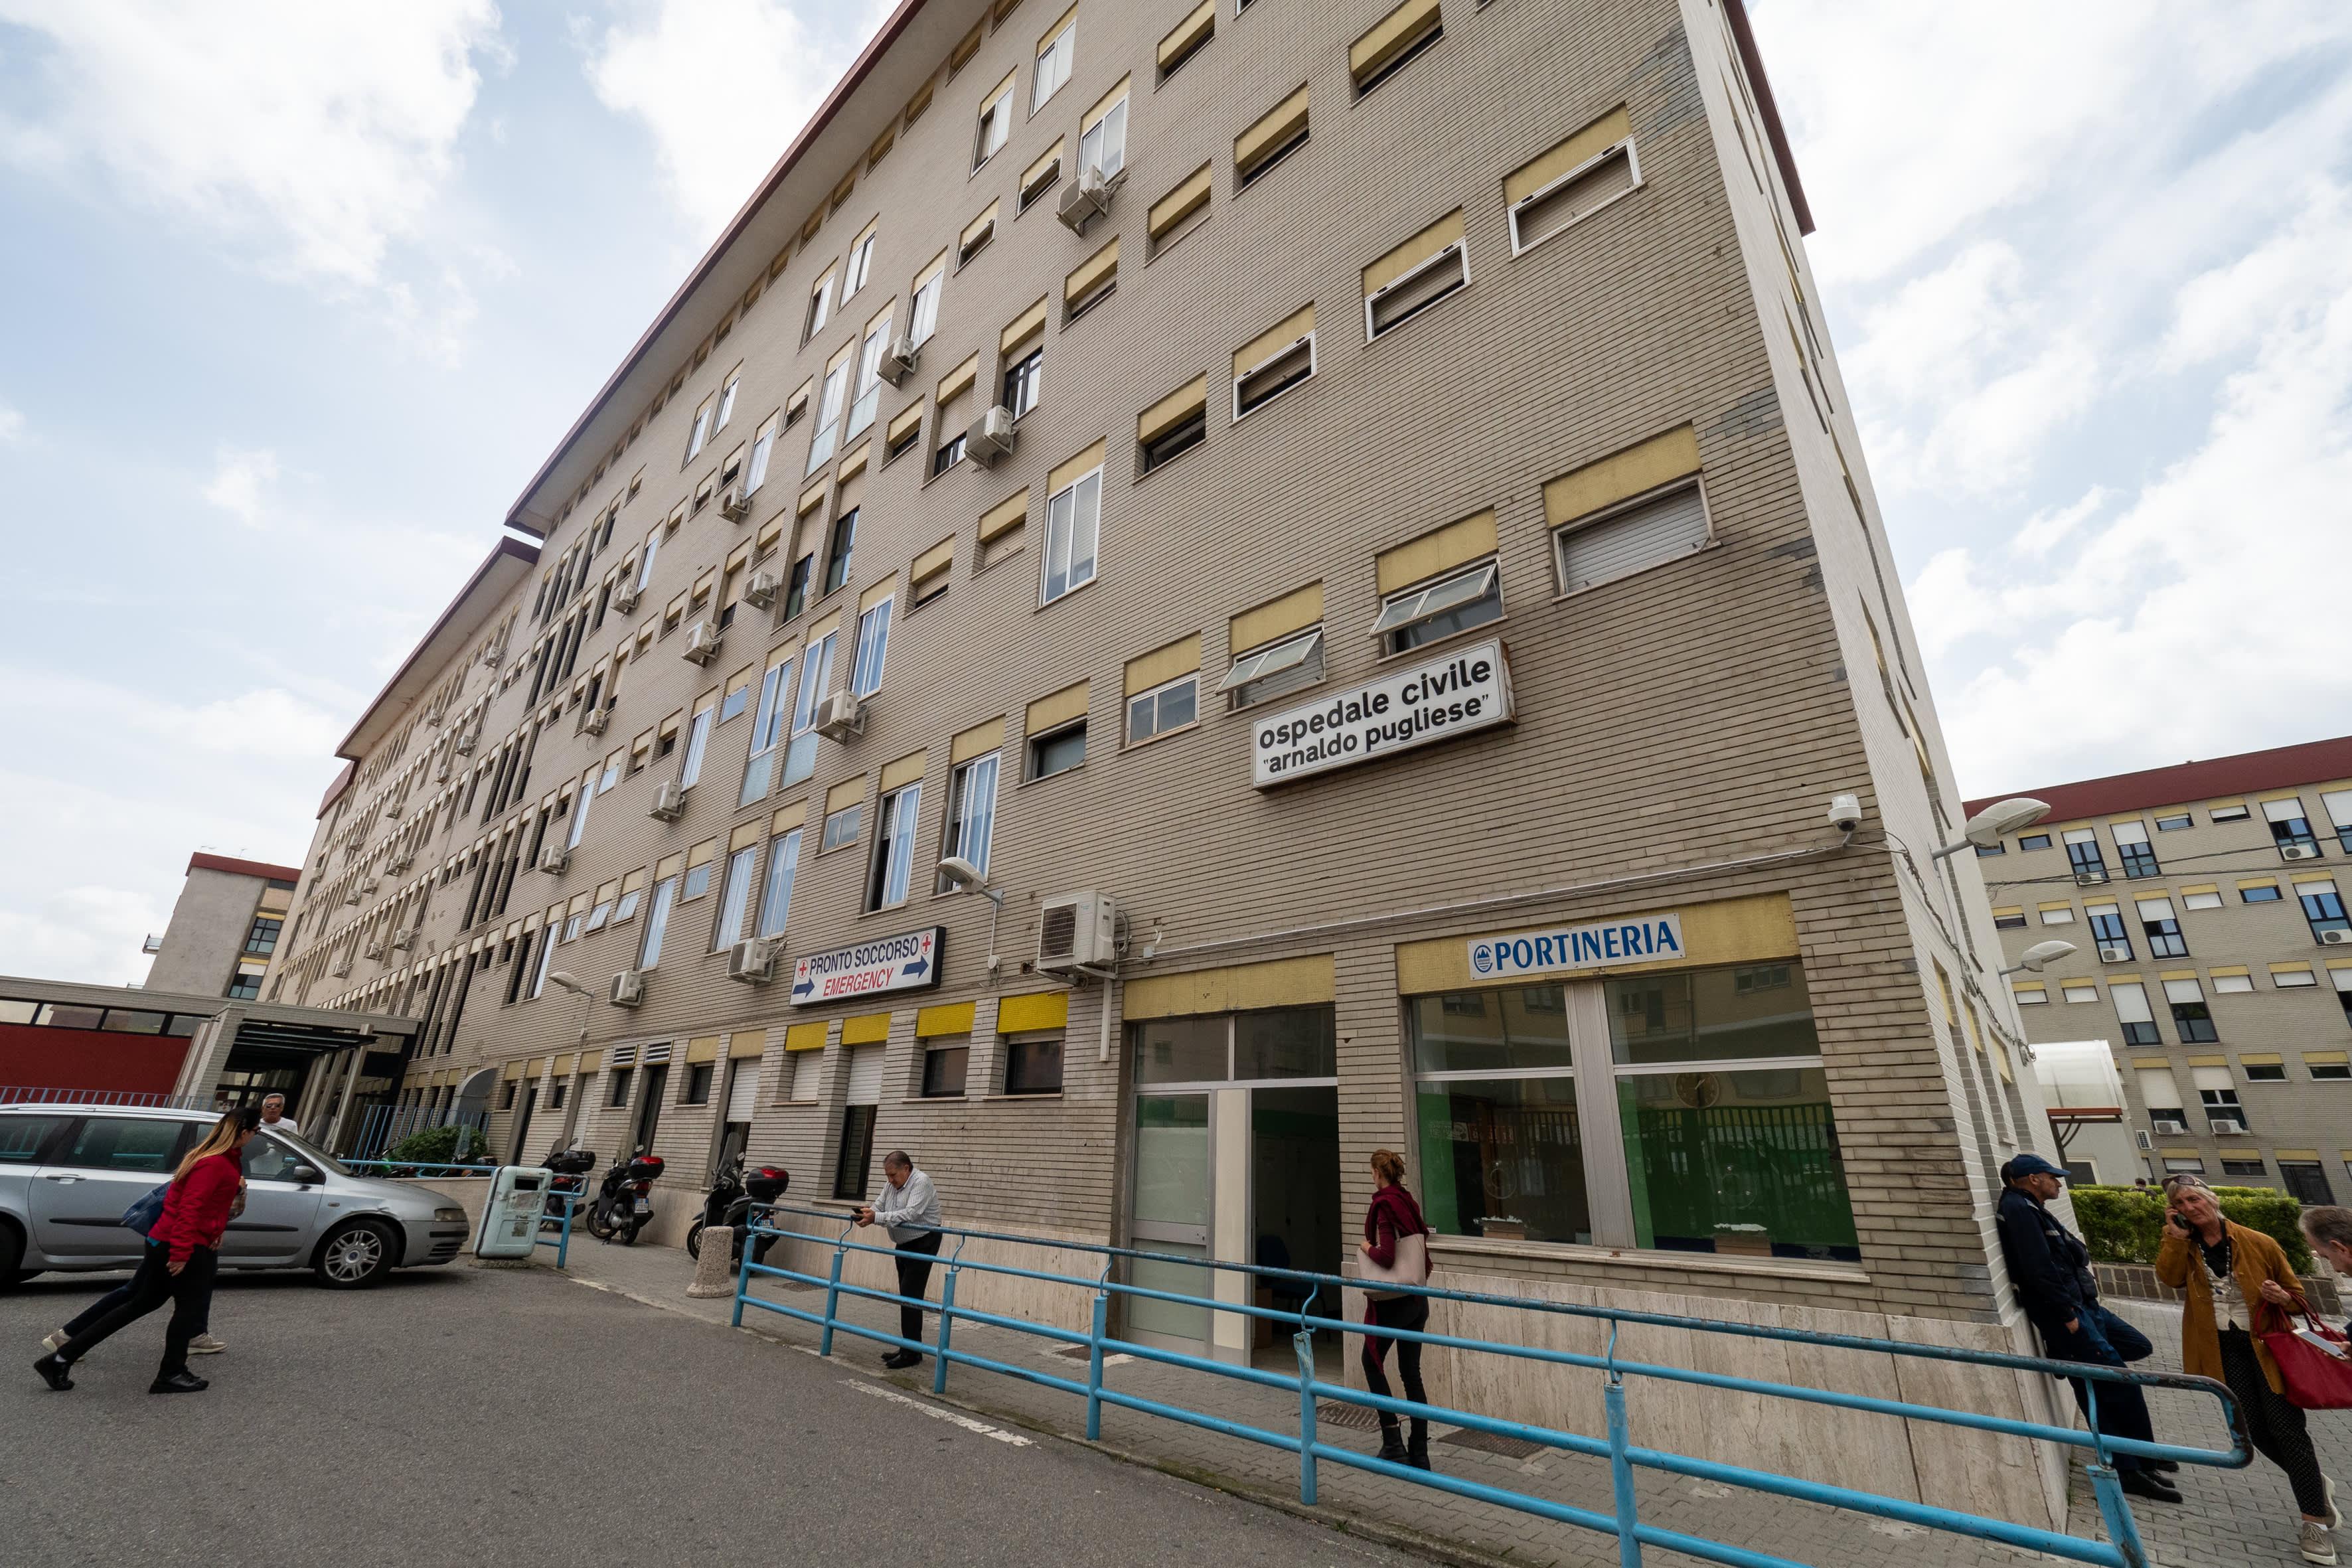 ospedale bitcoin)